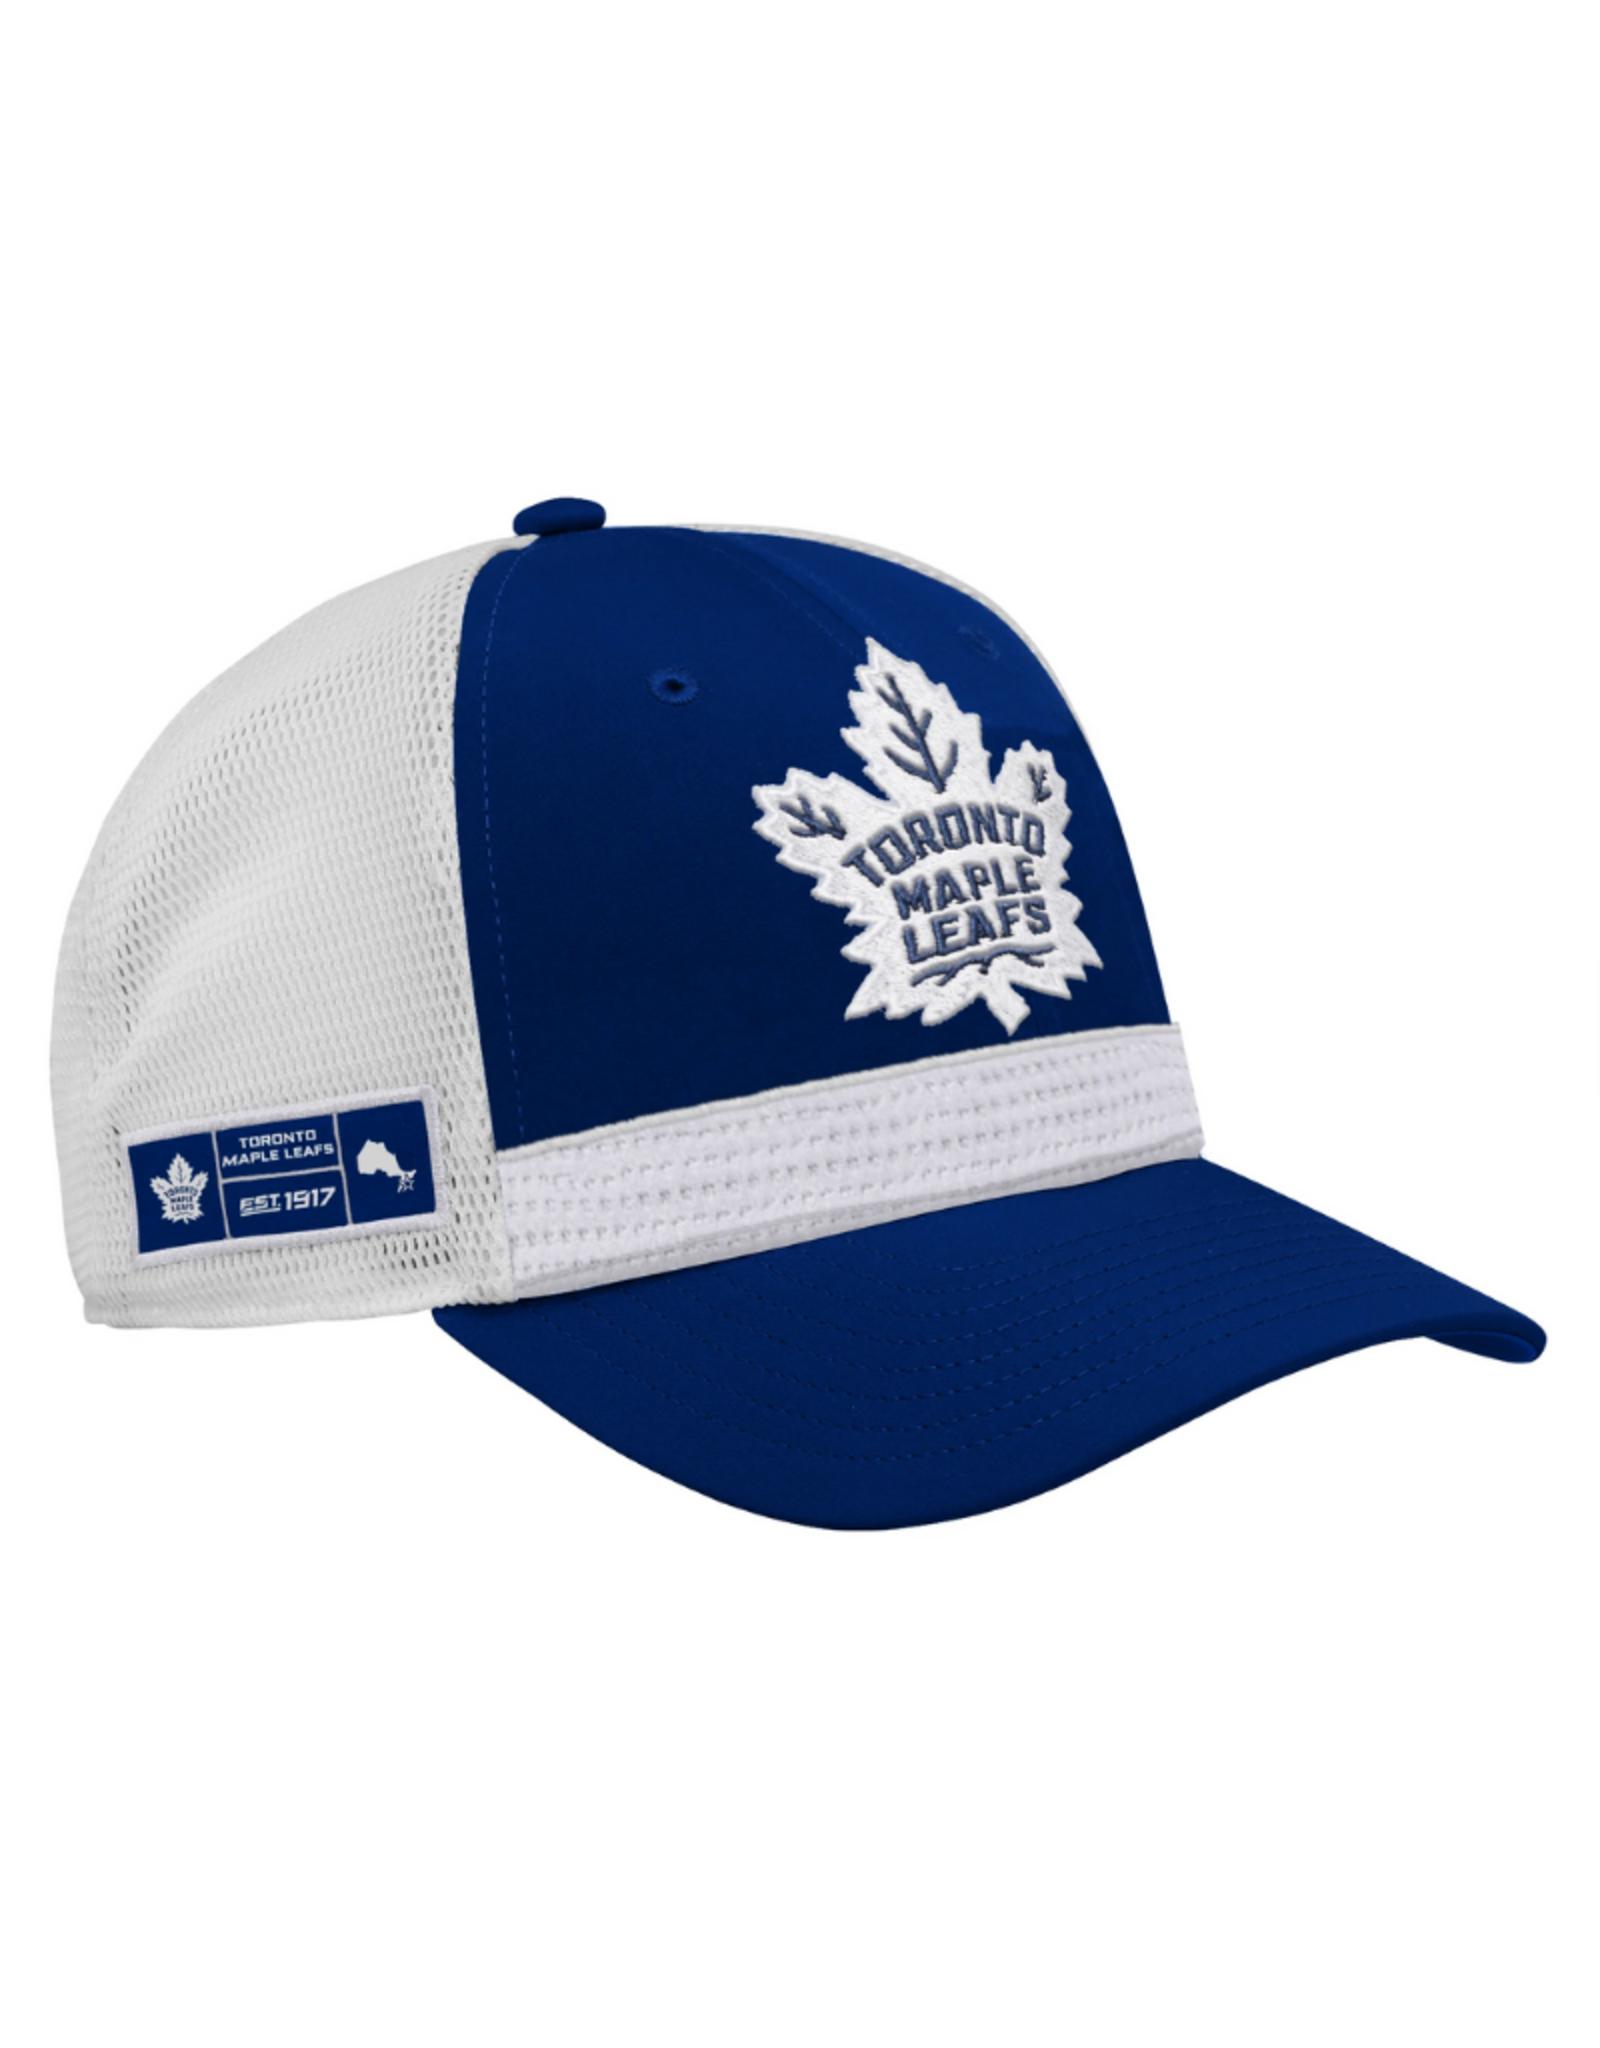 Fanatics Fanatics Youth '20 Adjustable Draft Hat Toronto Maple Leafs